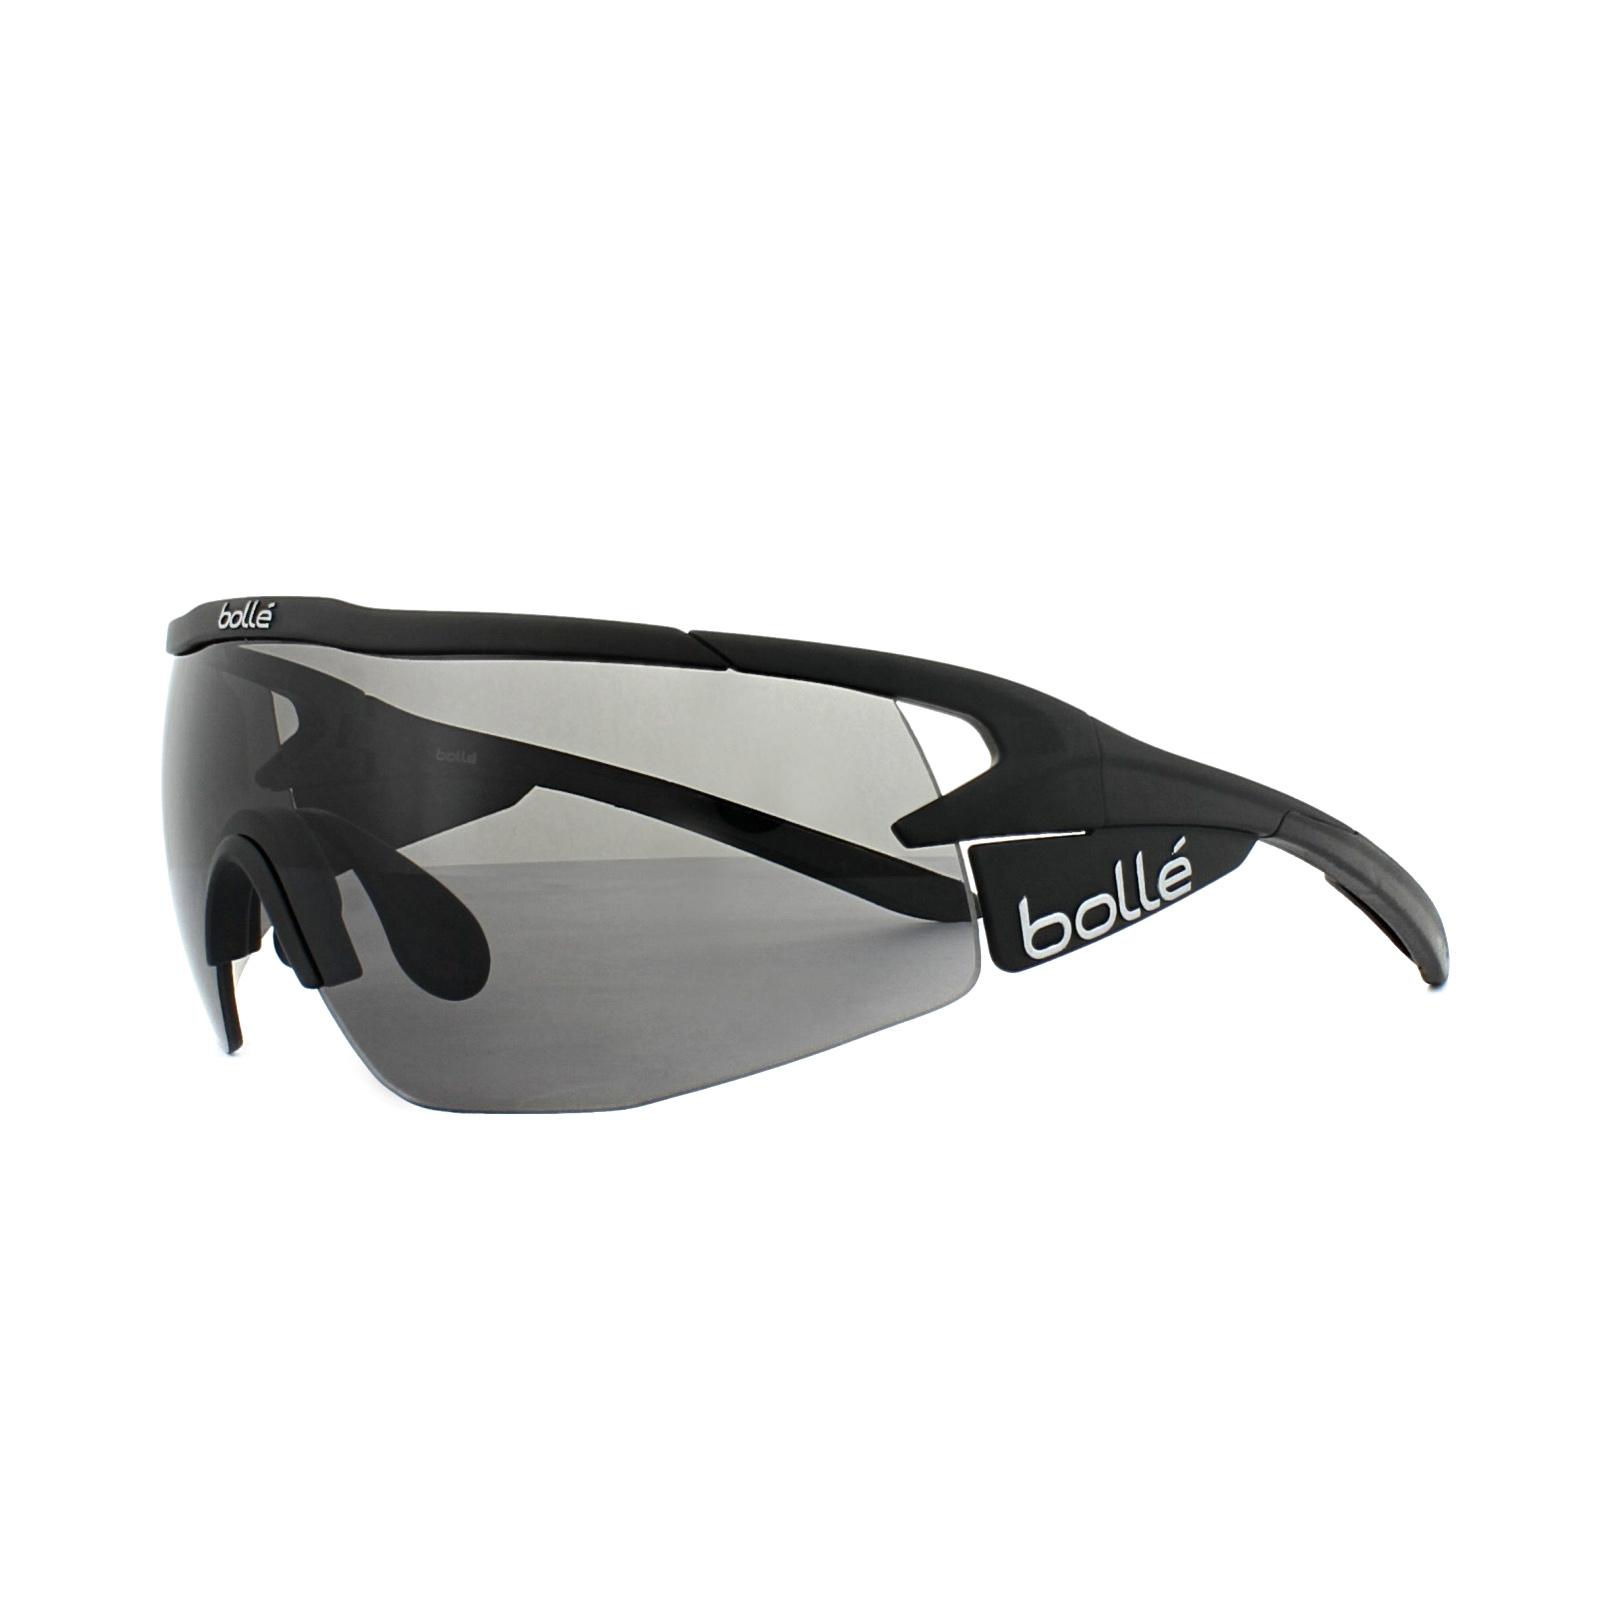 e185f38baf Cheap Bolle Aeromax Sunglasses - Discounted Sunglasses